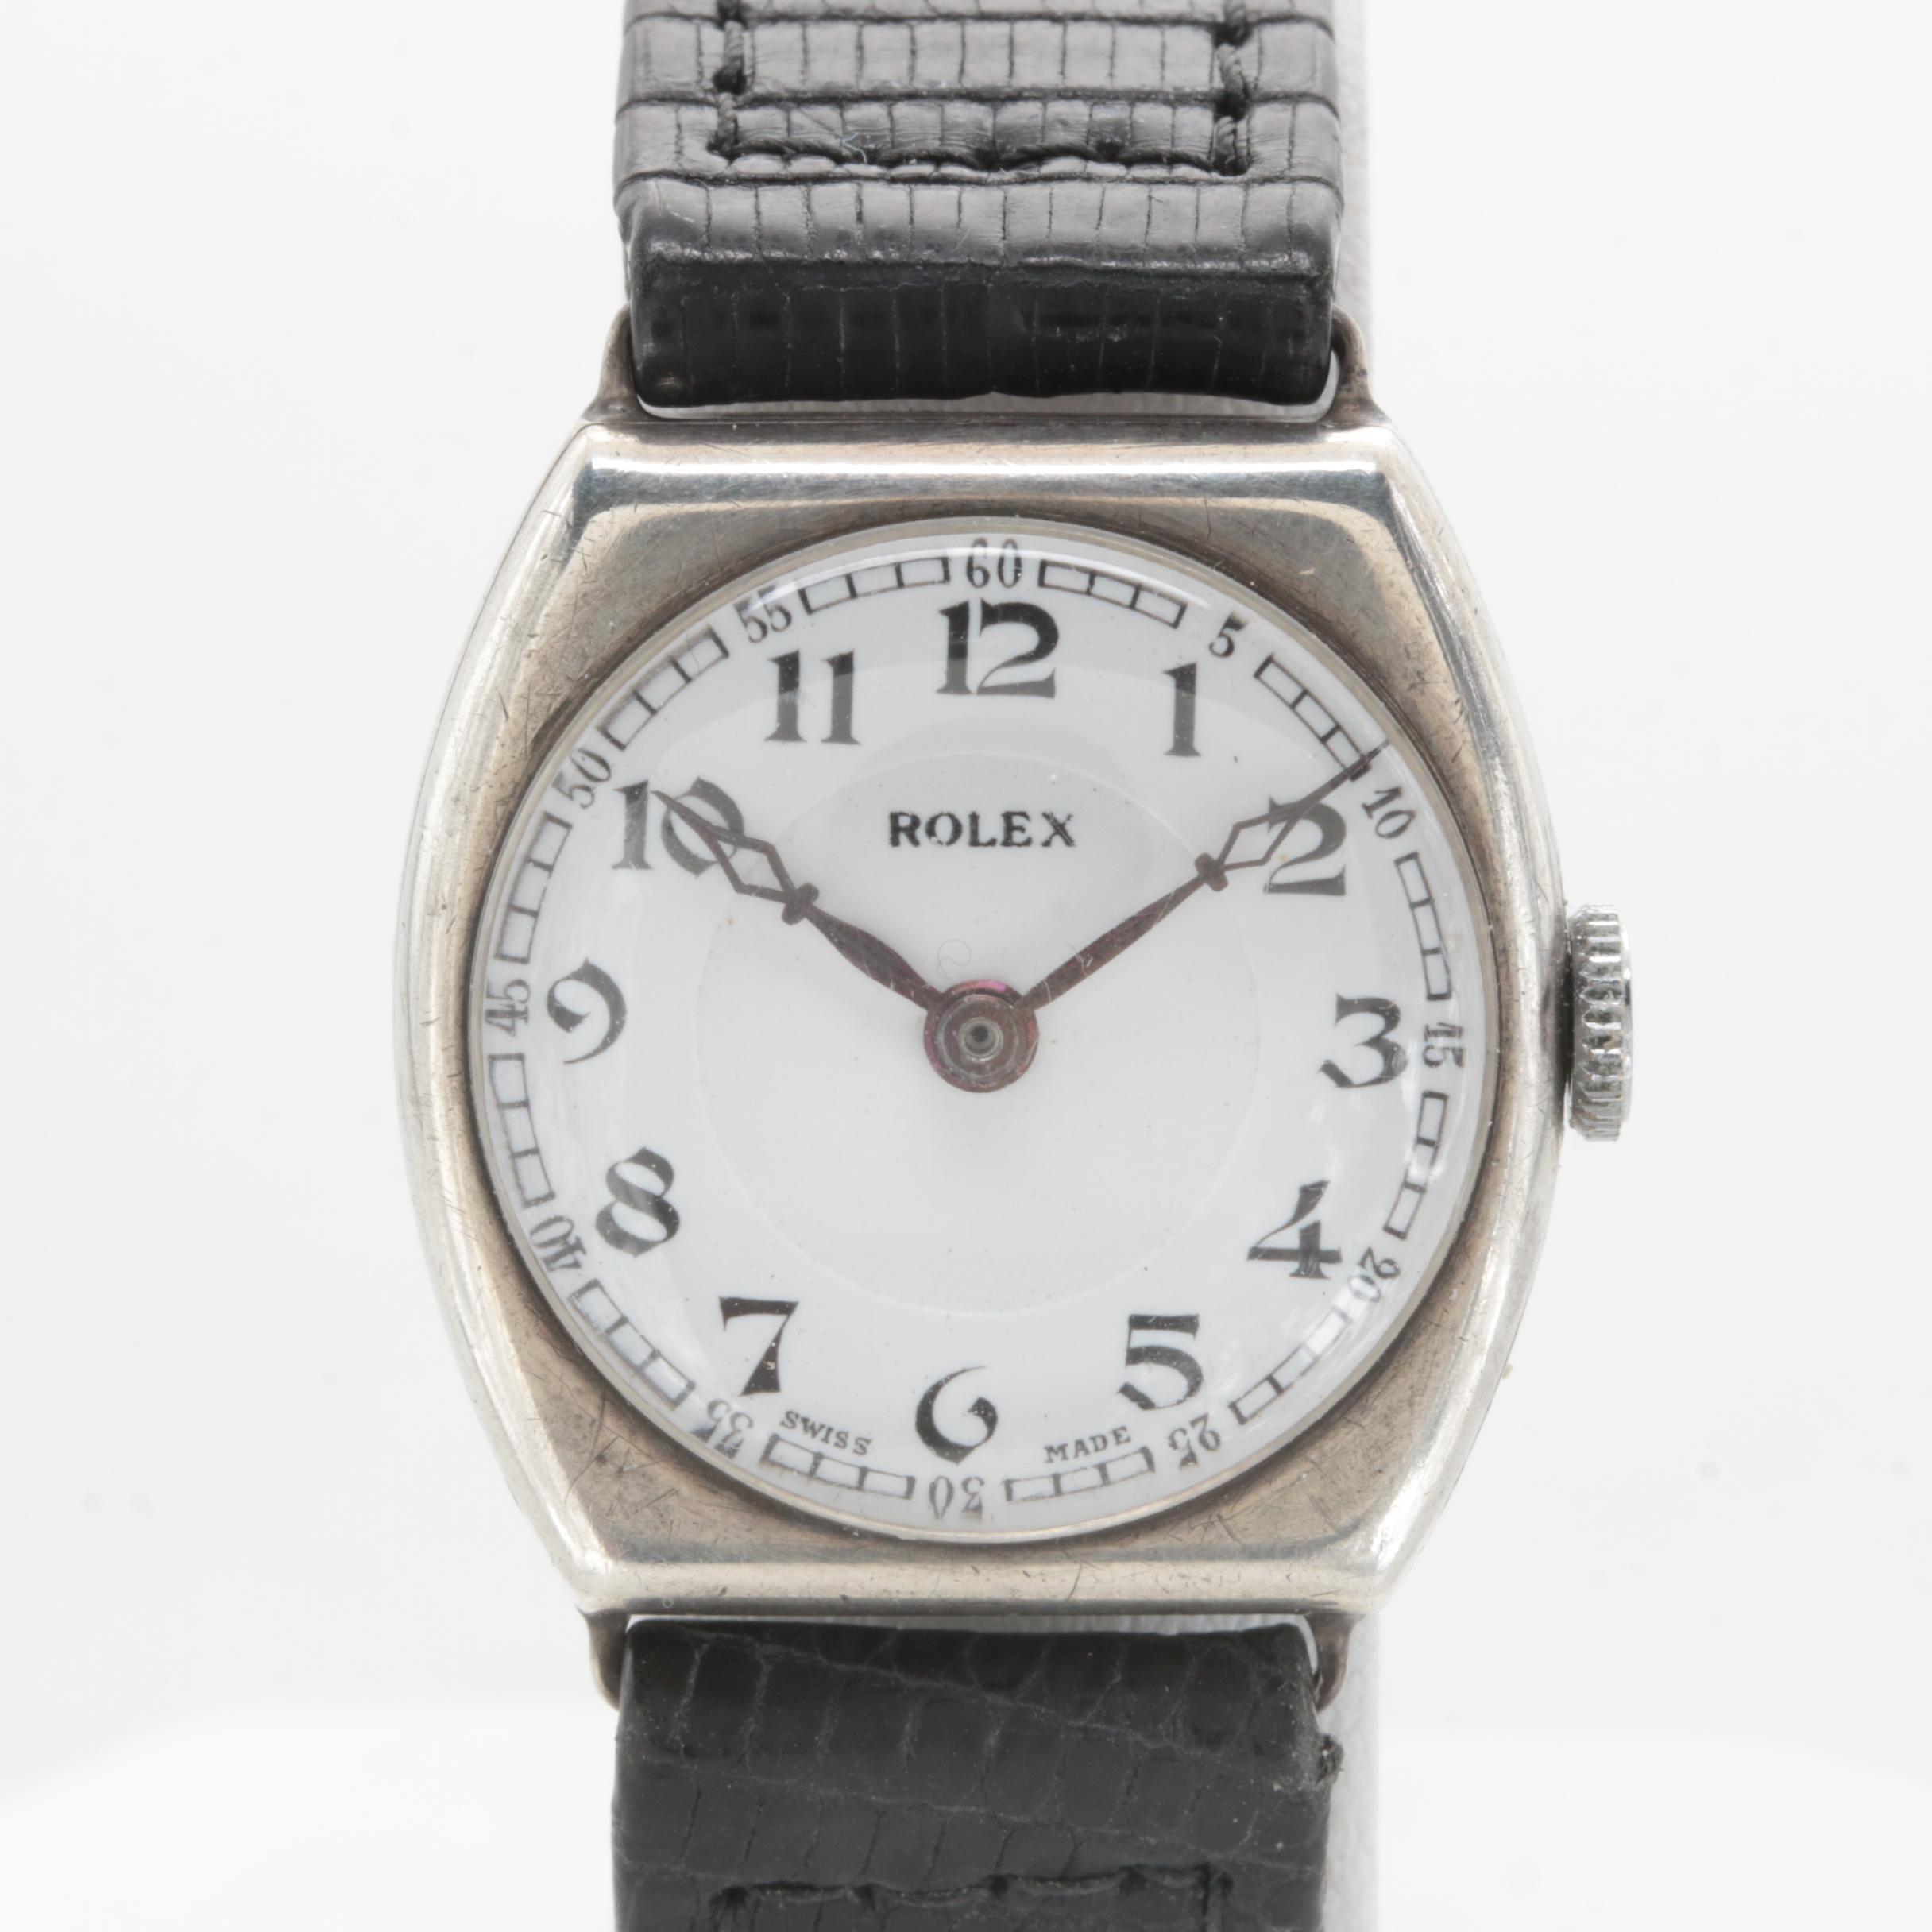 Rolex Ultra Prima Movement in Sterling Silver Case